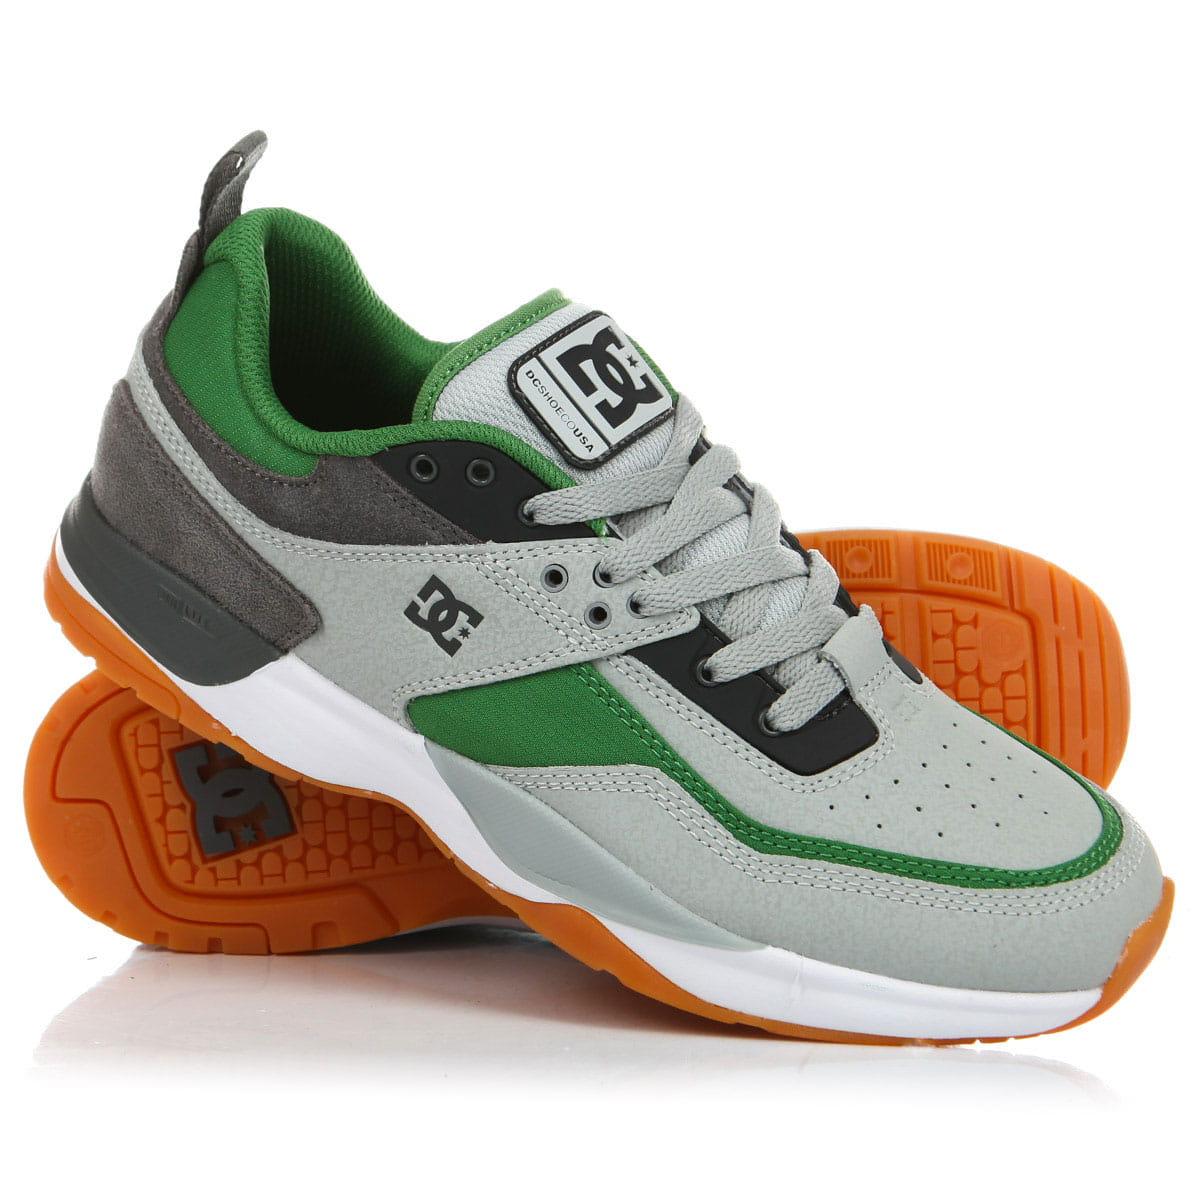 a945e325 Купить кроссовки Dс E.tribeka Grey/Green (ADYS700173-GGB) в интернет ...